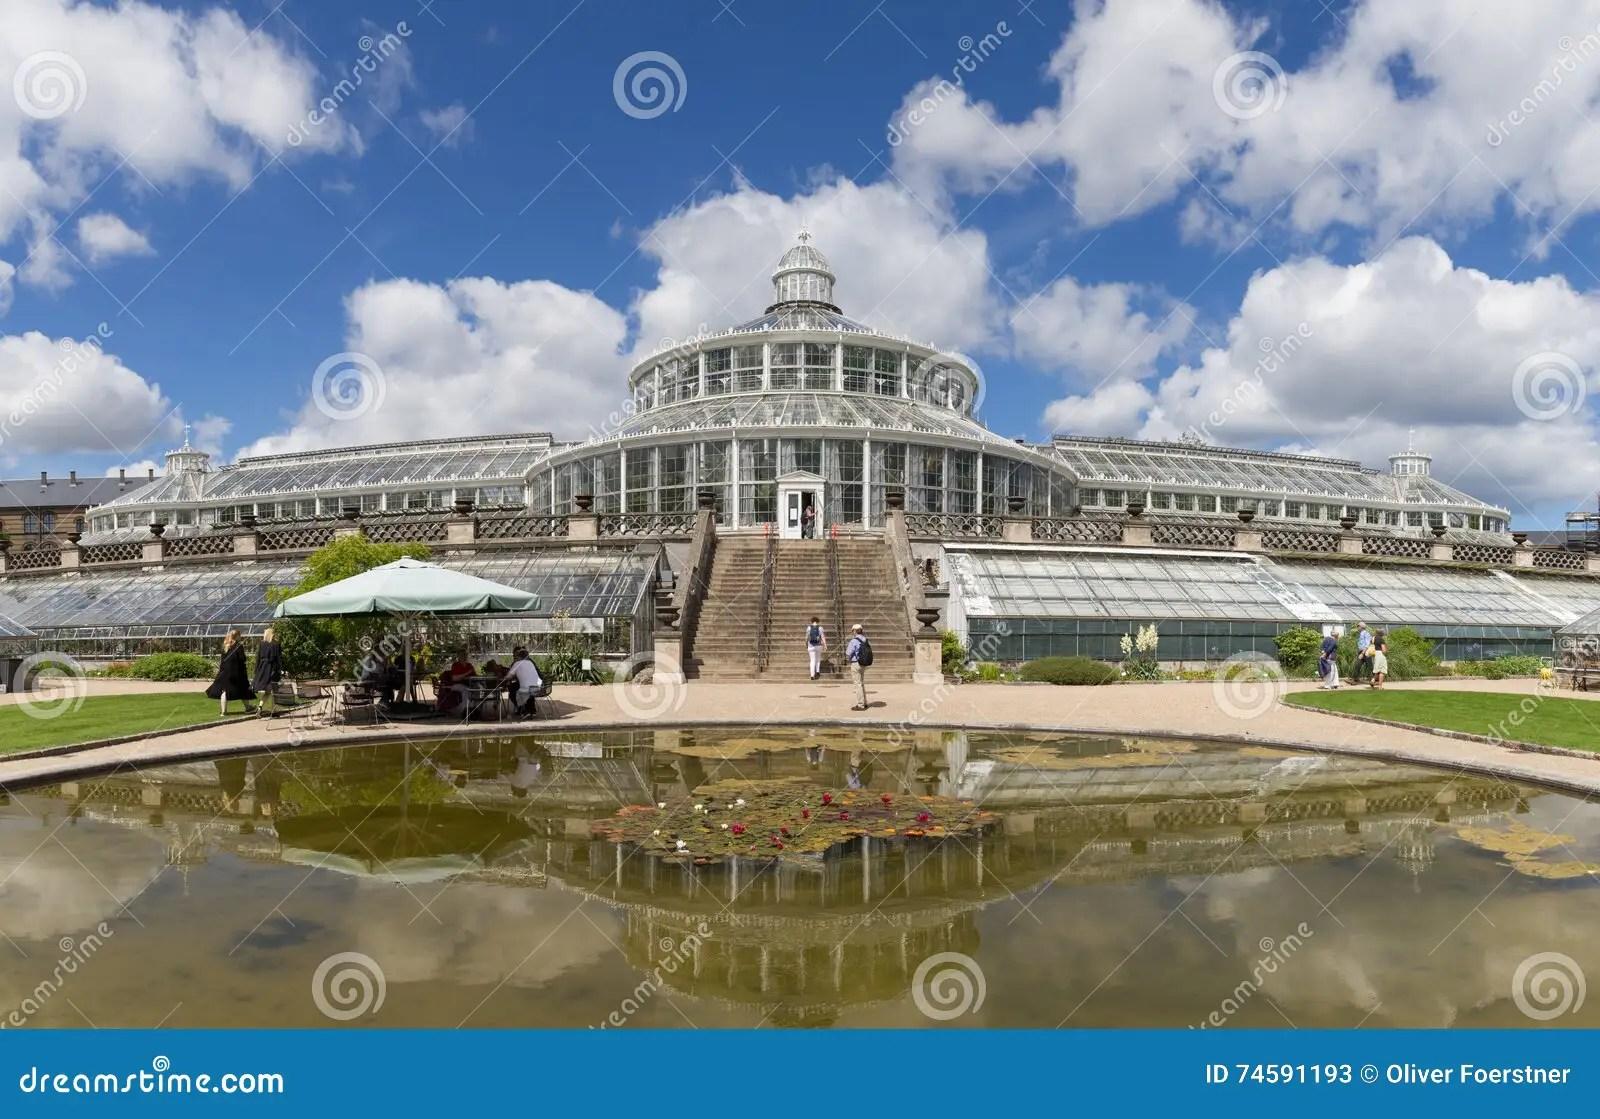 Botanischer Garten In Kopenhagen Dänemark Redaktionelles